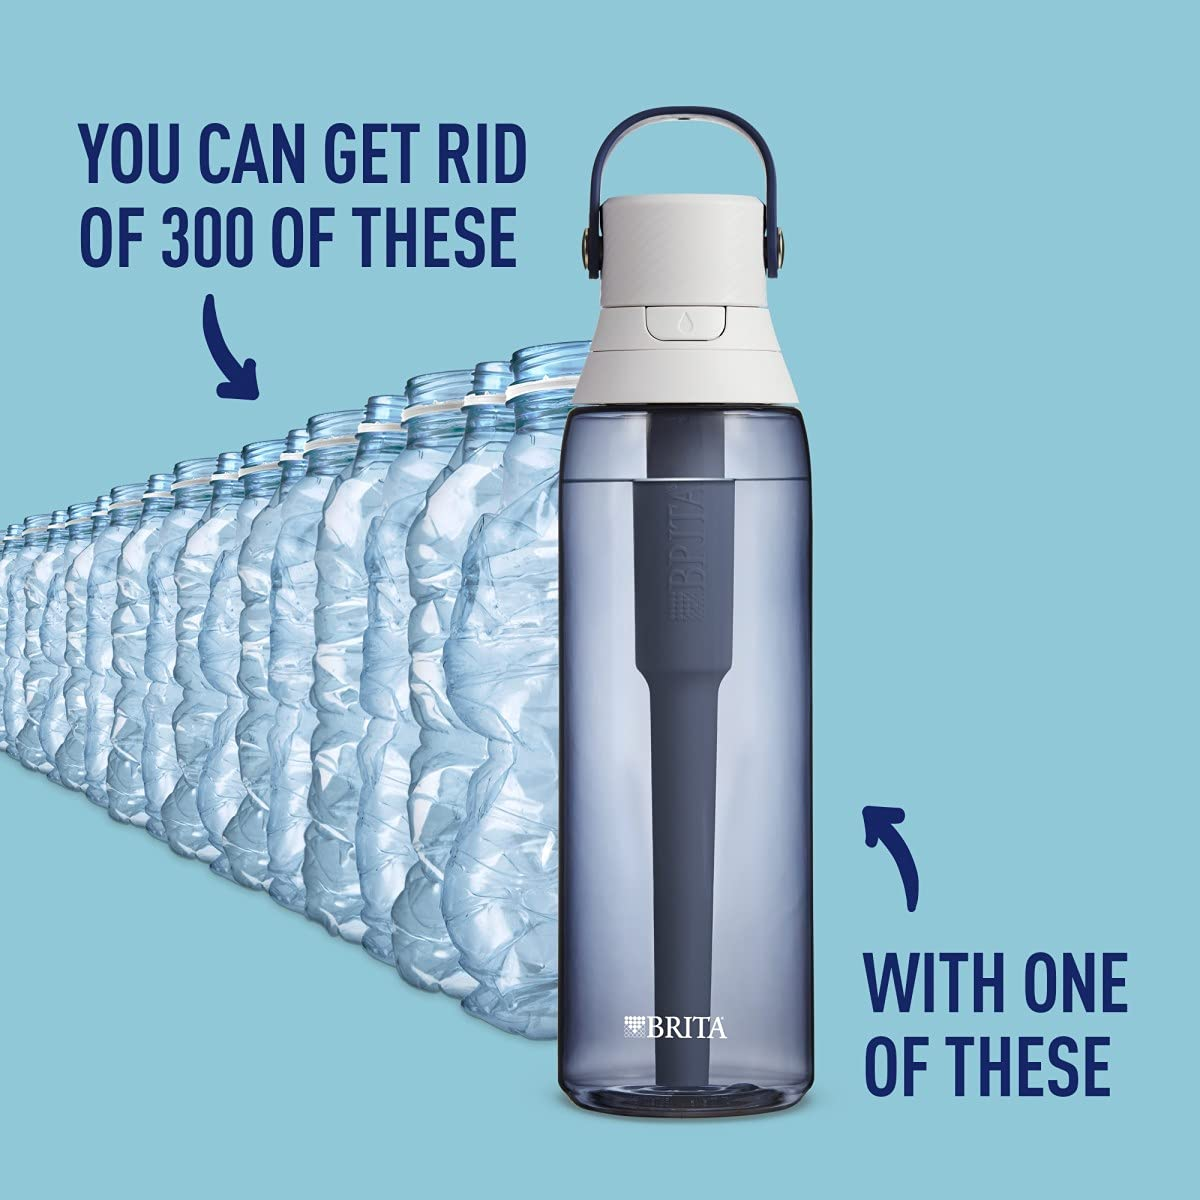 Genuine Brita Disc Filter Refills For Active Water Bottle Quantity 1 3 6 12 24